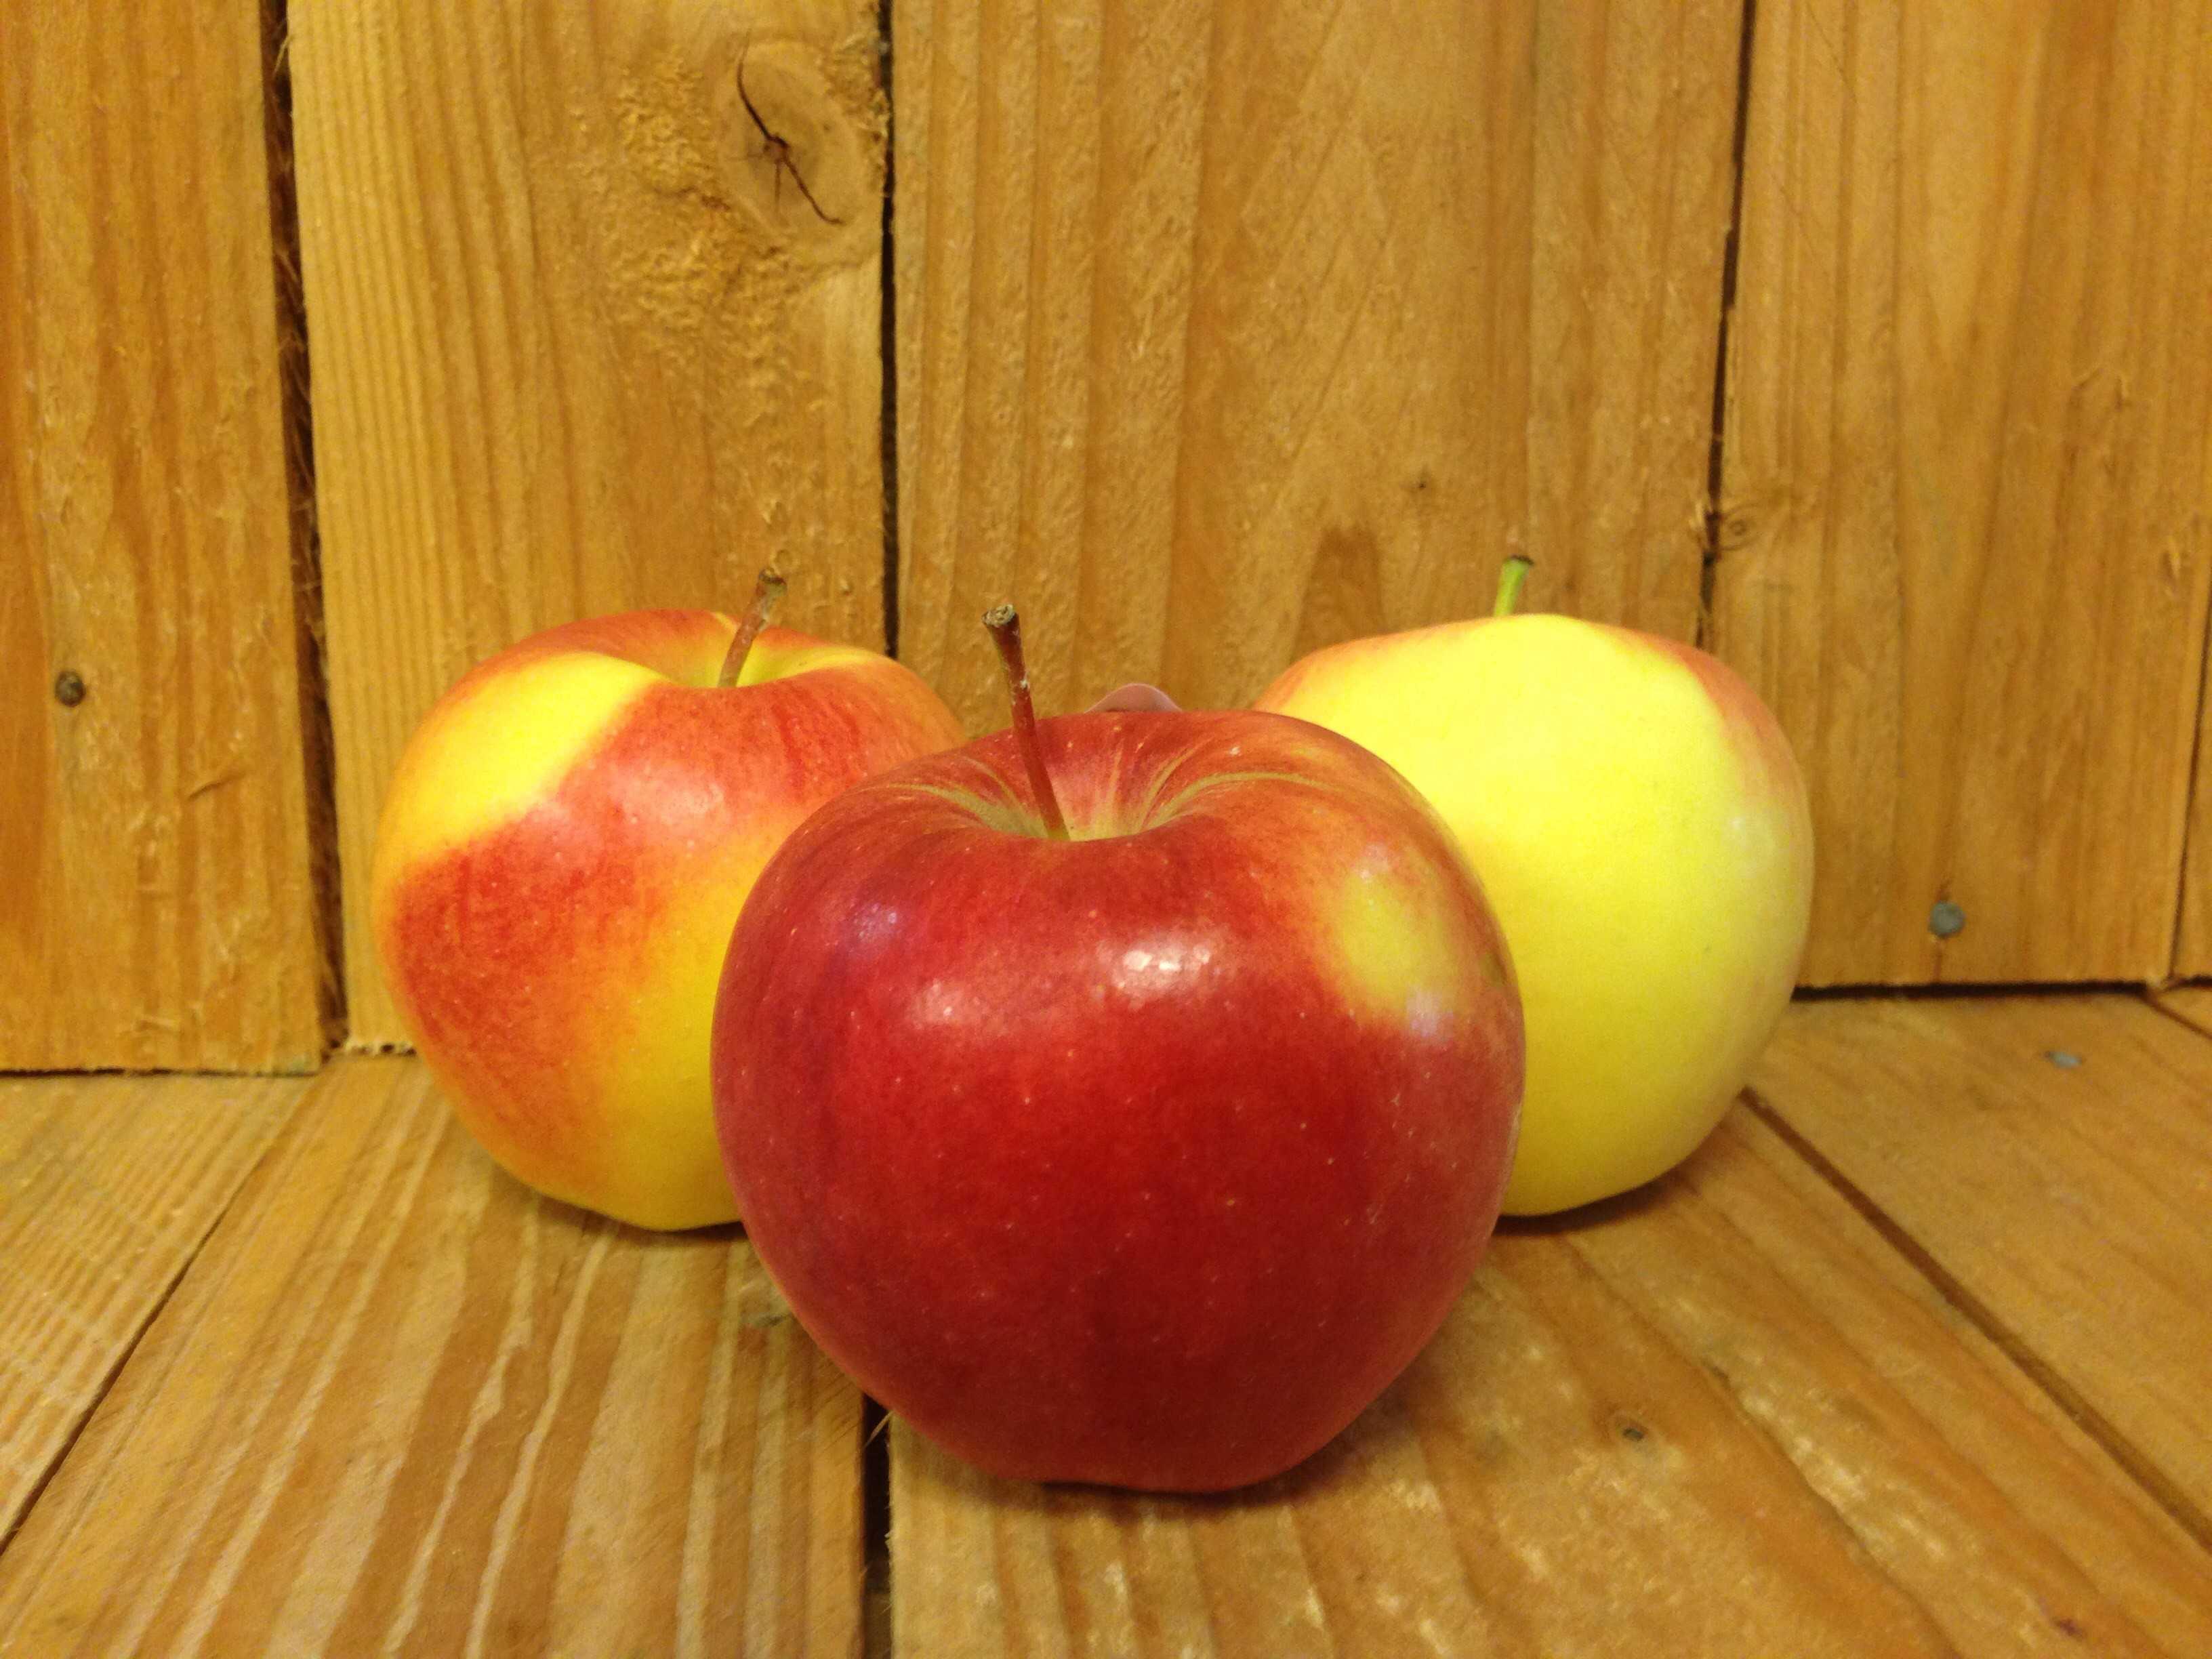 Apples – Ambrosia BC (Bag of 5)